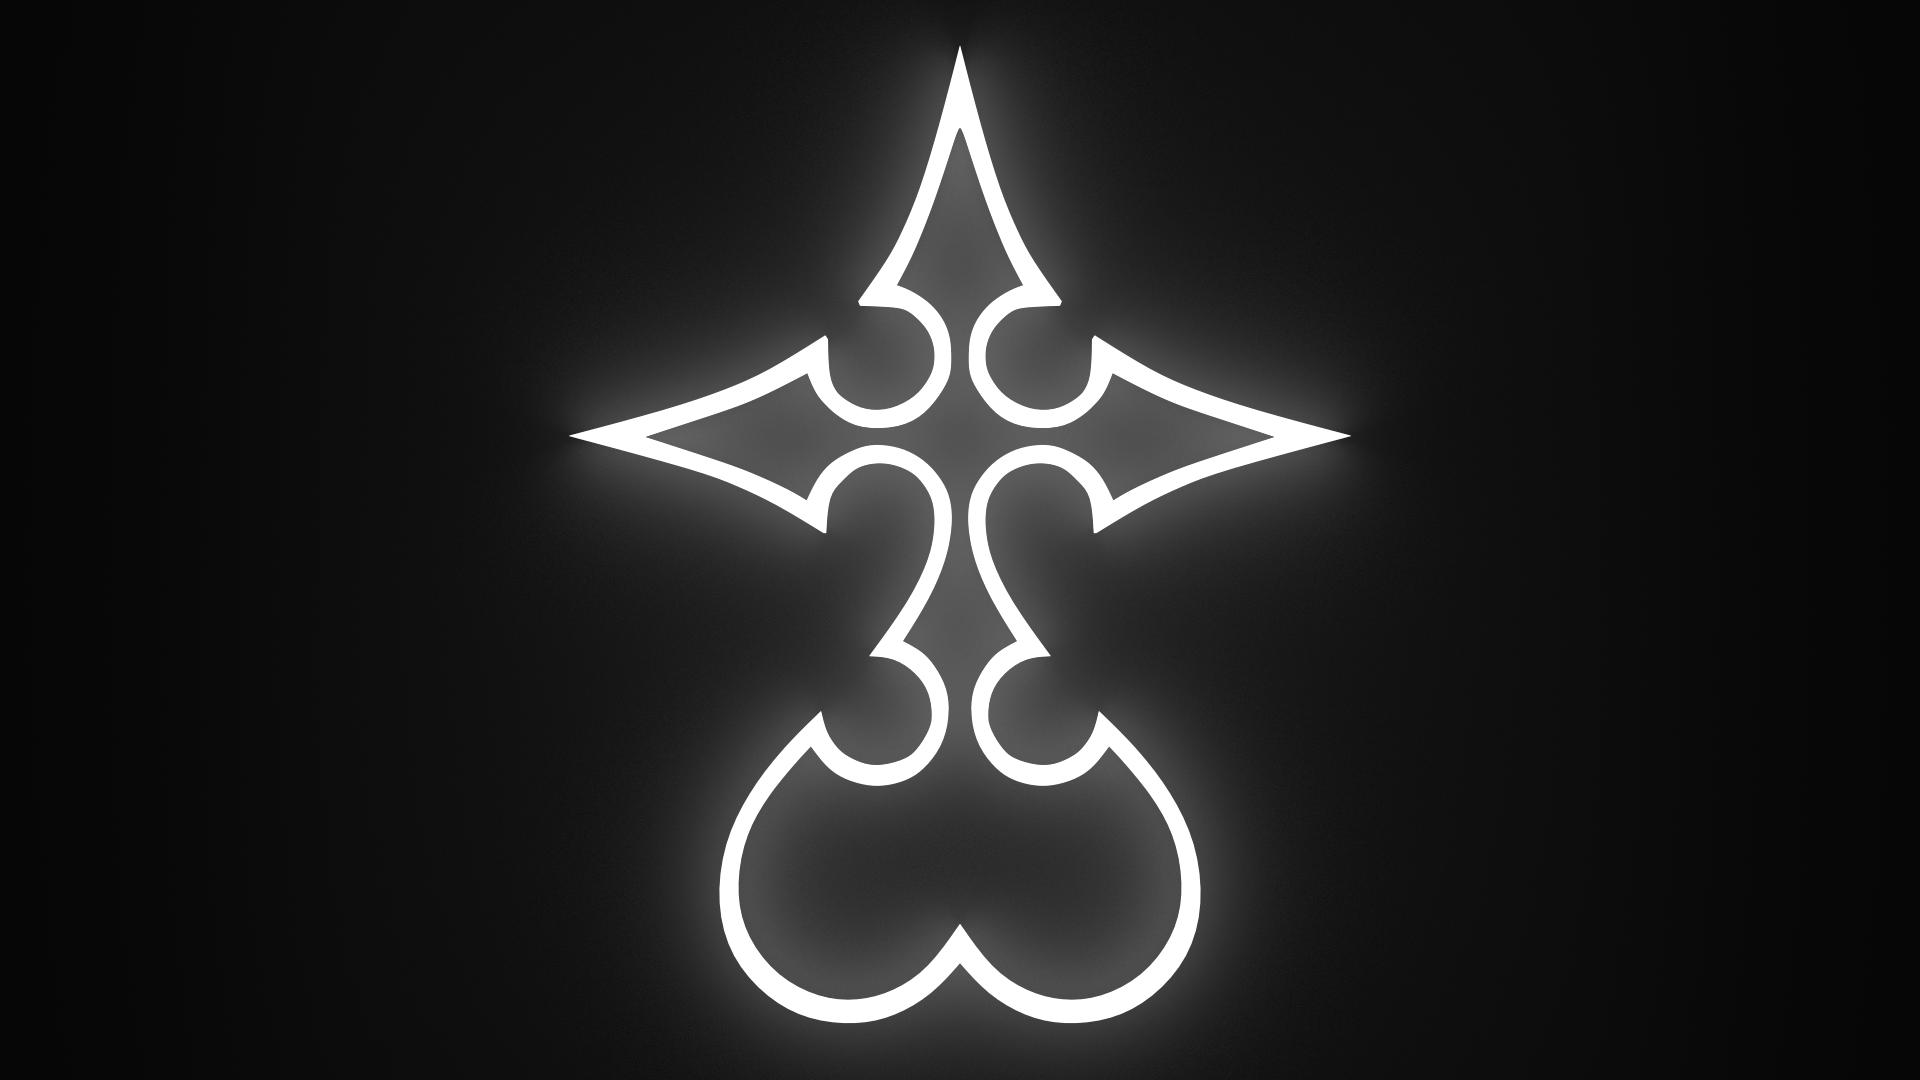 Kingdom Hearts - Nobody Wallpaper